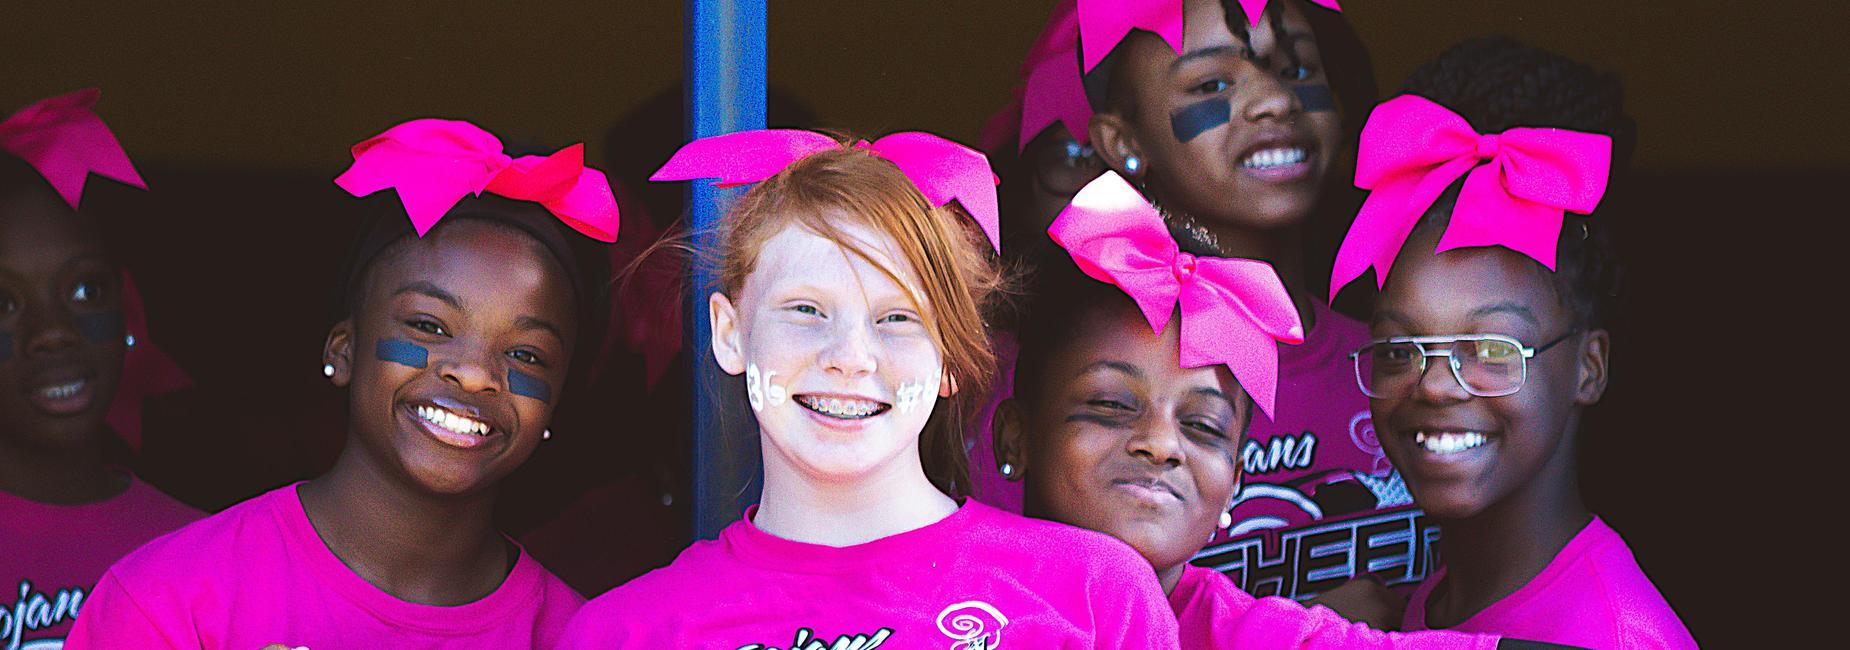 Nash Central Middle School cheerleaders